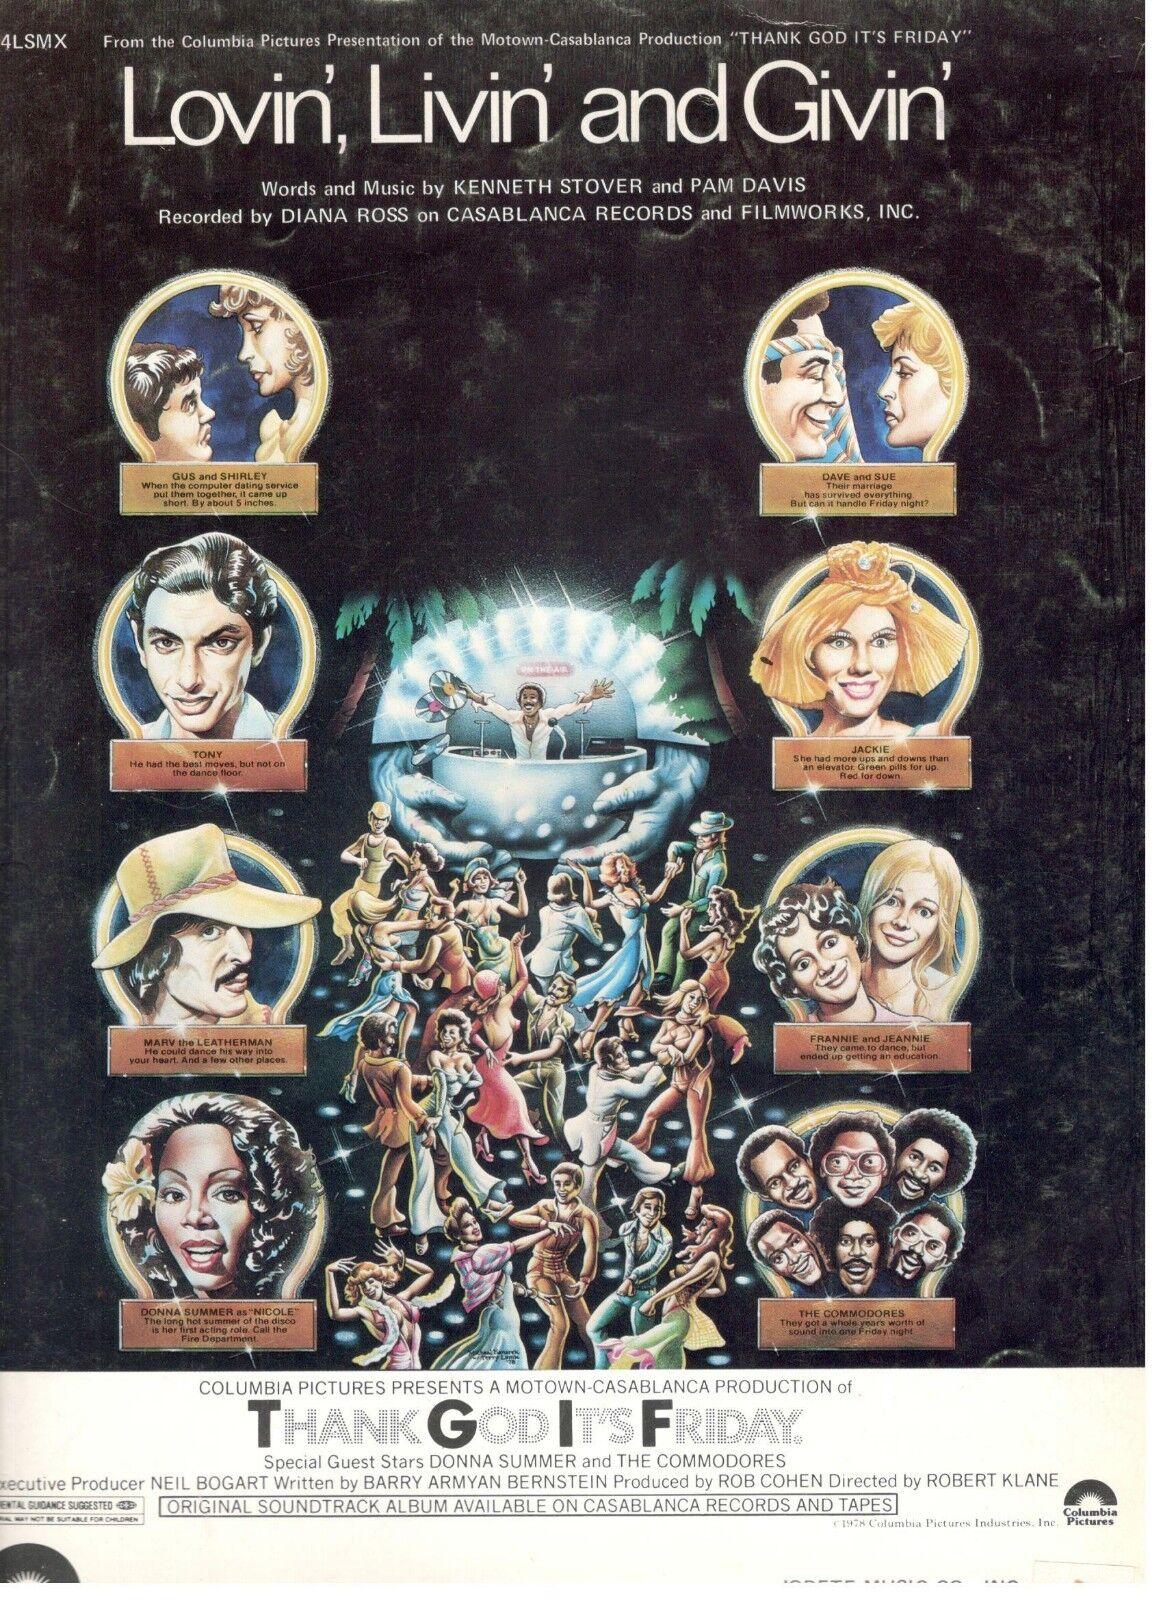 DIANA ROSS-LOVIN', LIVIN' AND GIVIN' SHEET MUSIC-THANK GOD IT'S FRIDAY-1977-NEW